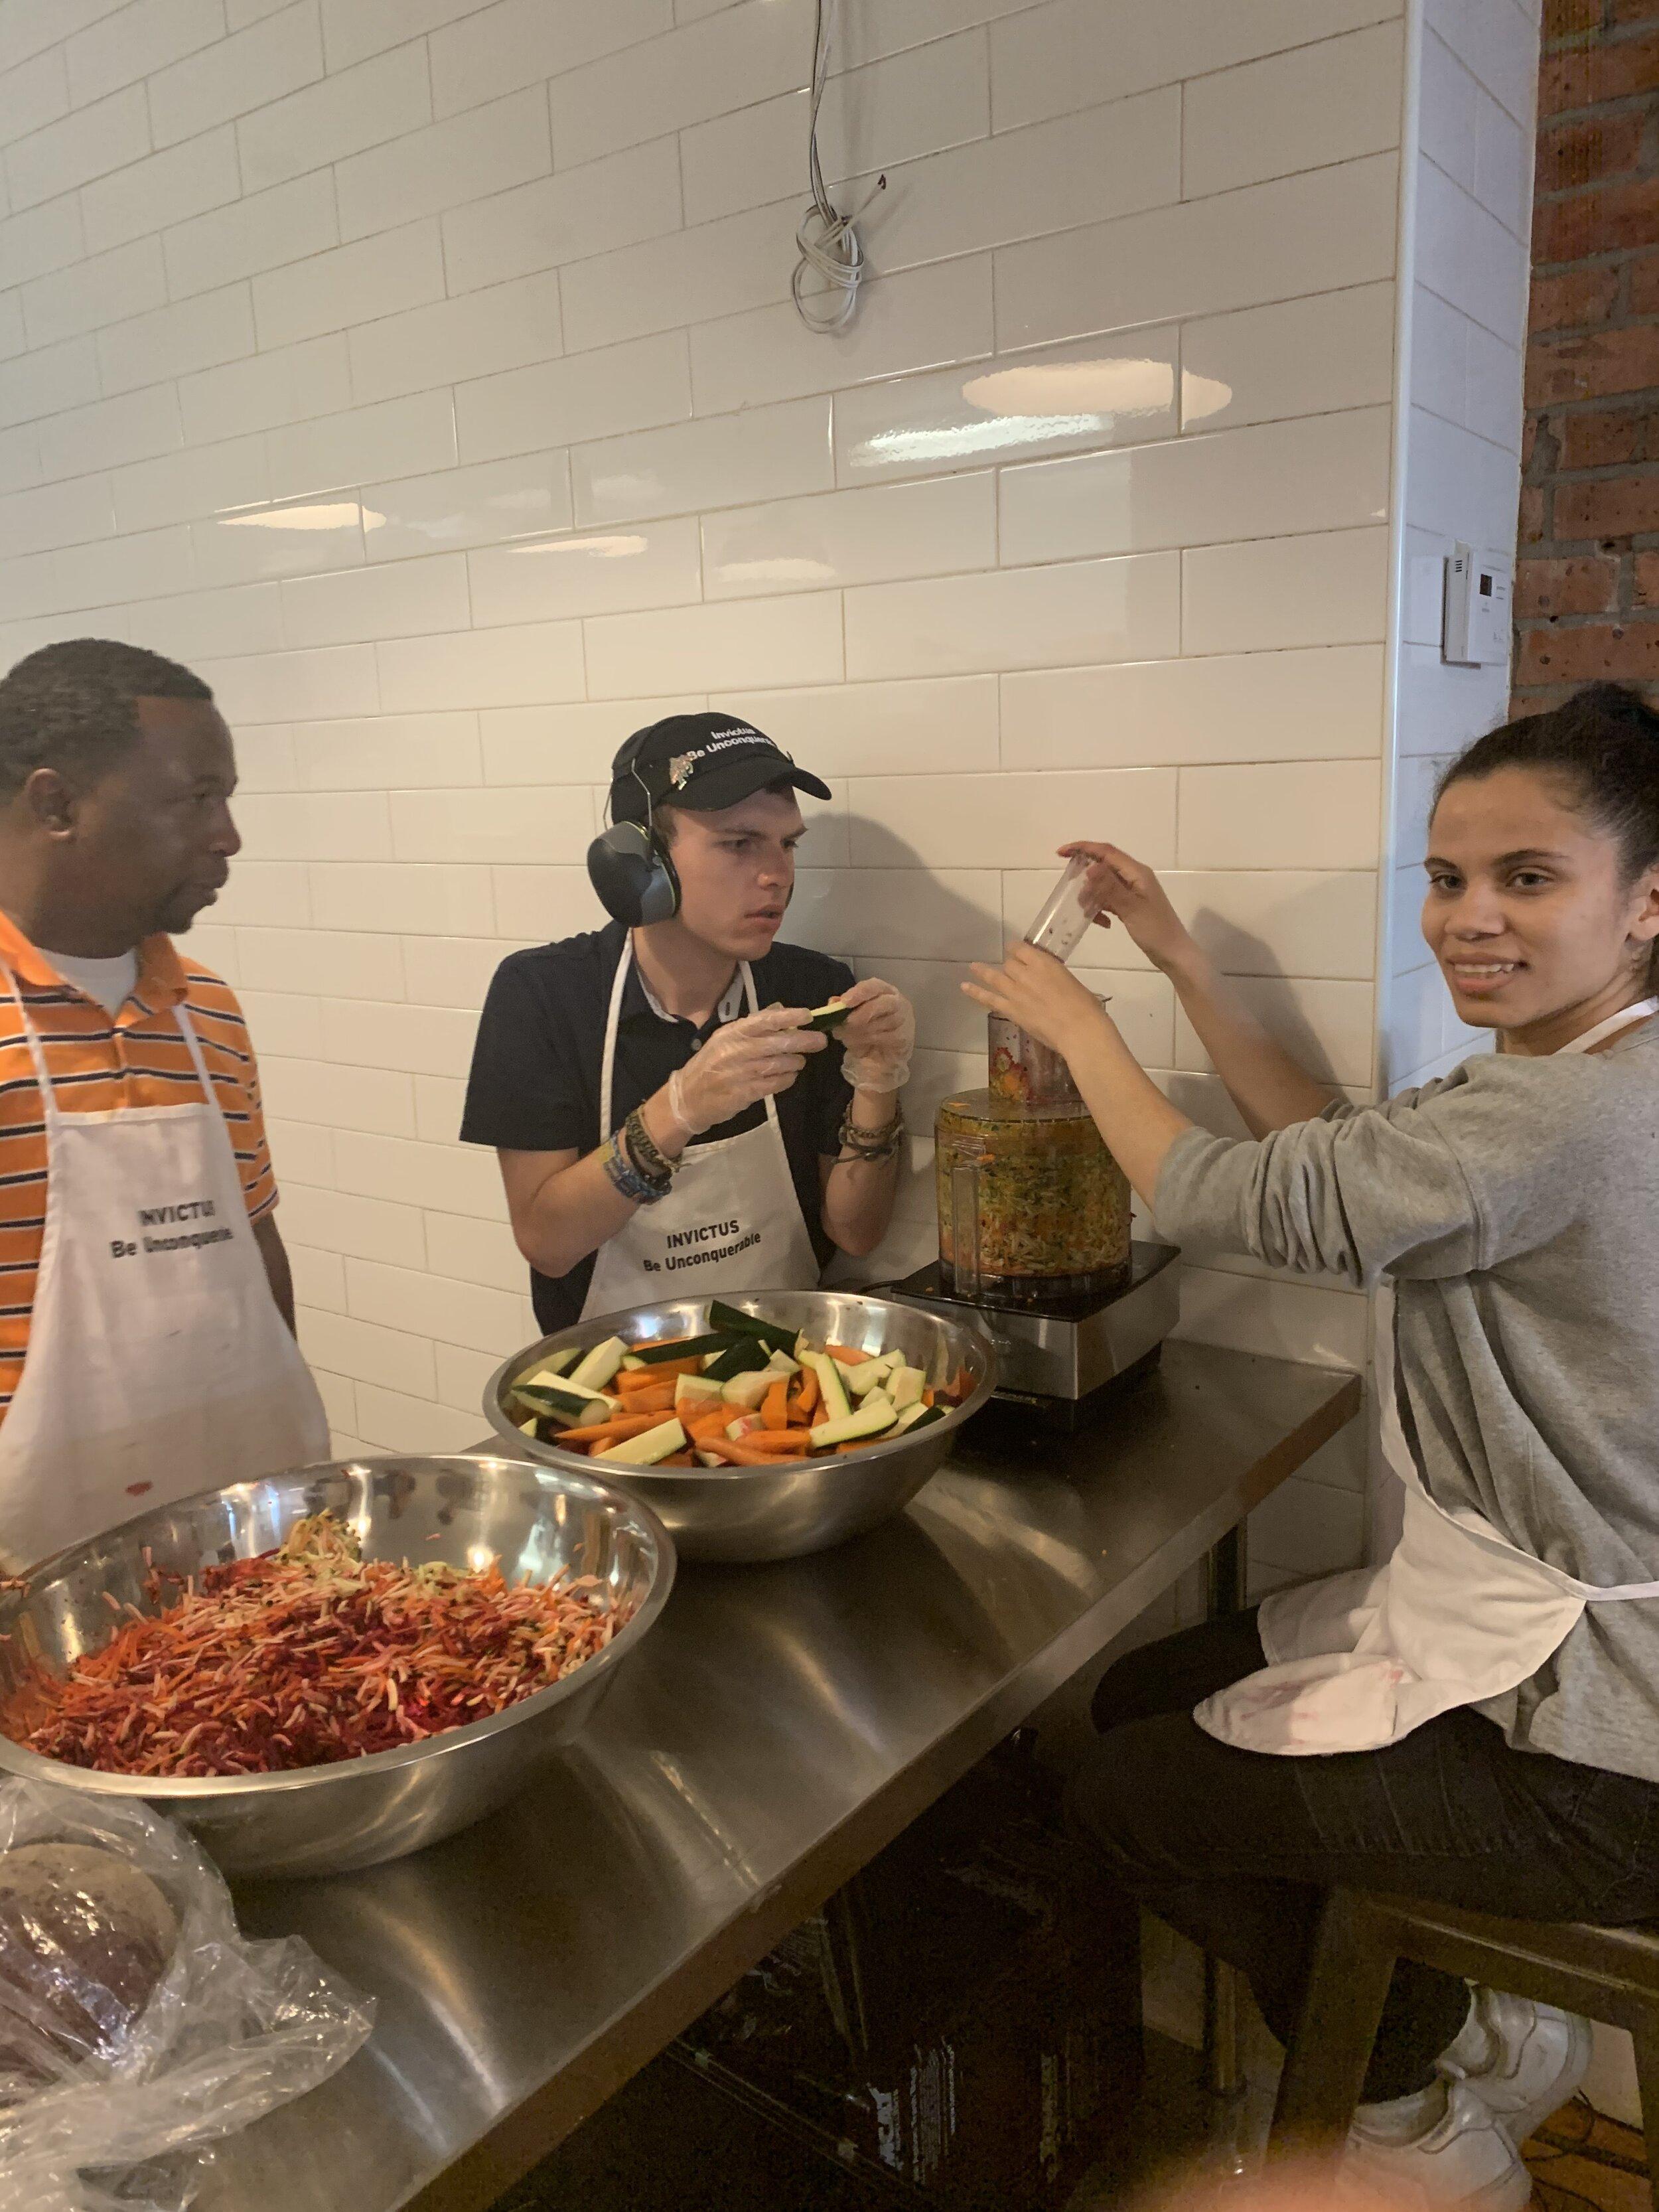 Jermaine, Dustin and Noa at Invictus Bakery